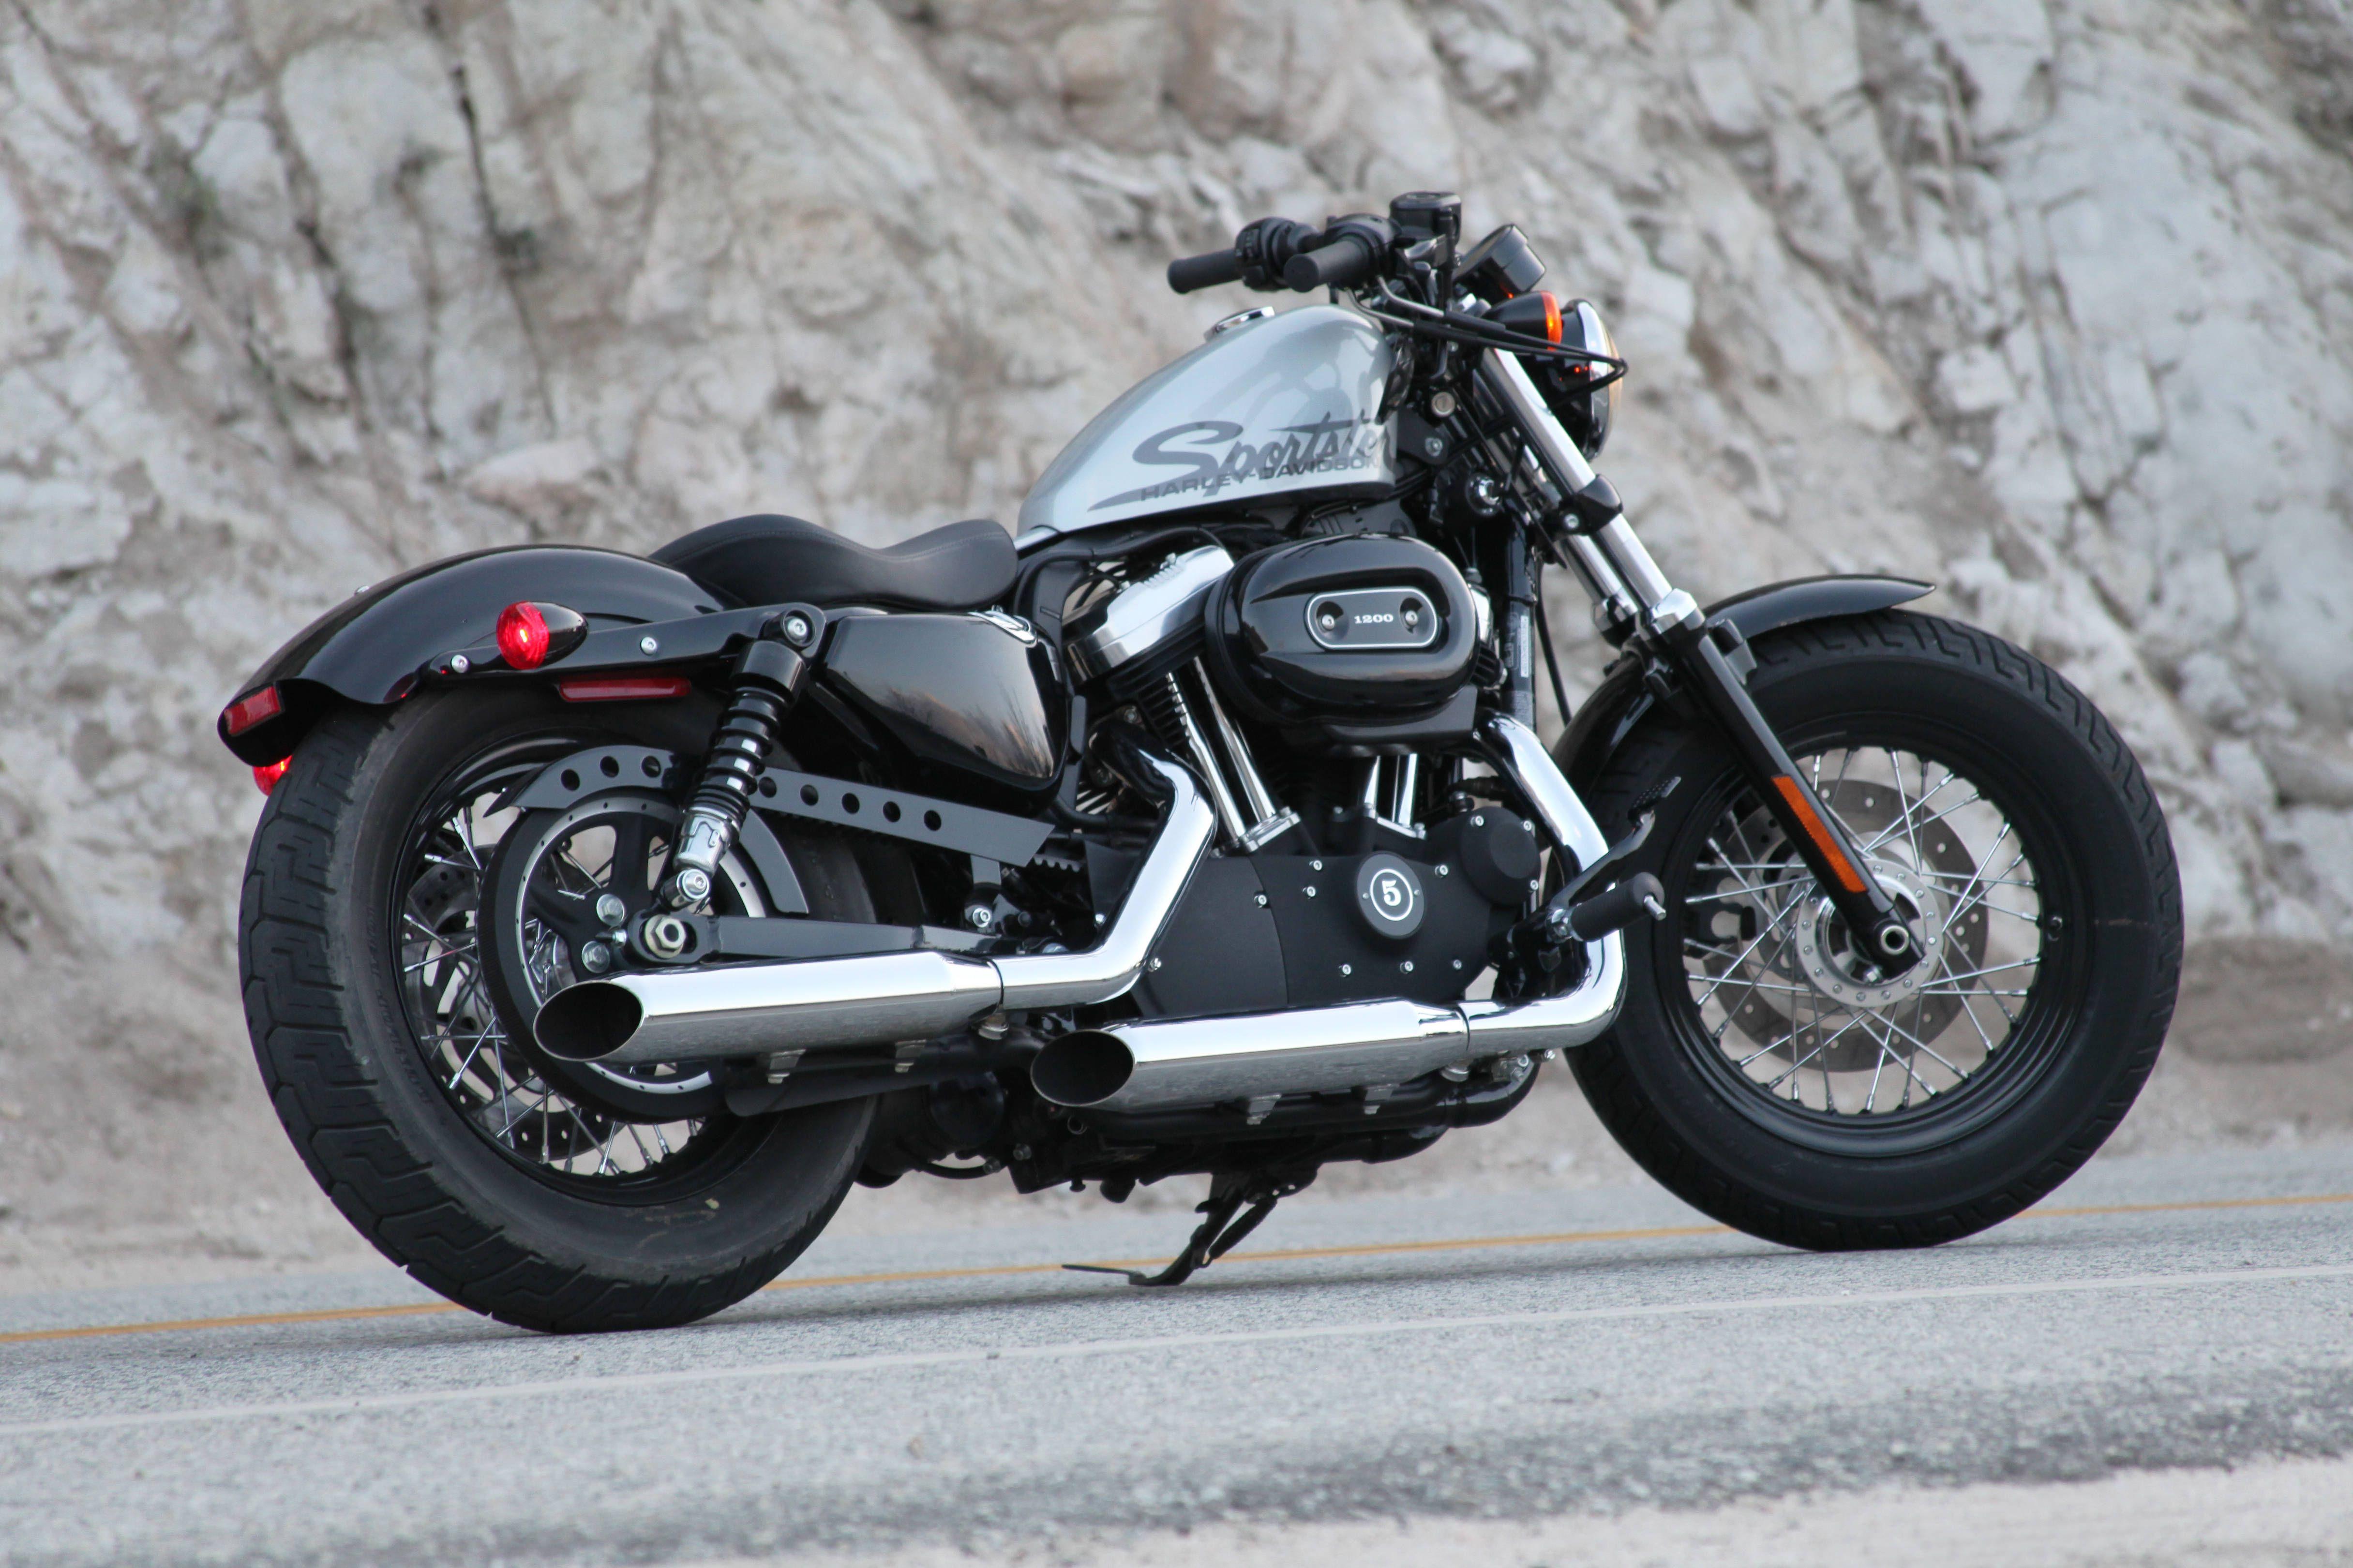 The Harley I Will Own Harley Davidson Motor Afbeeldingen